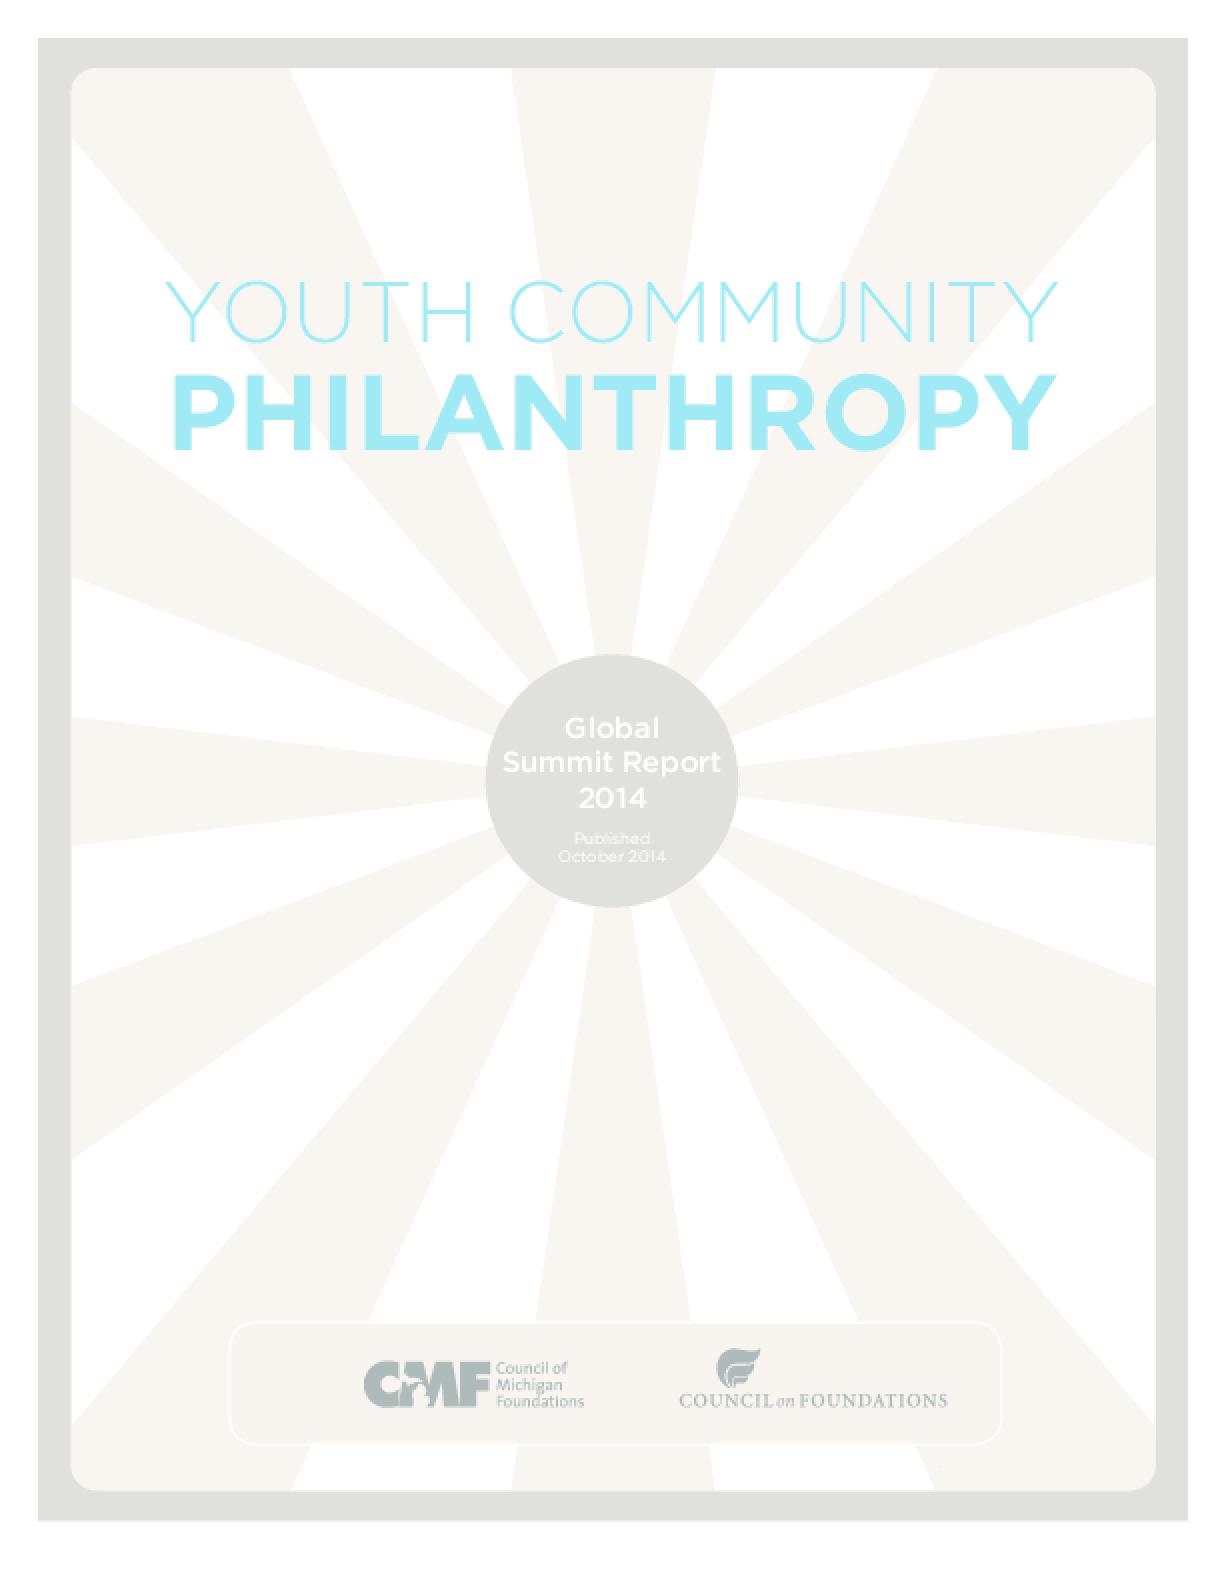 Youth Community Philanthropy